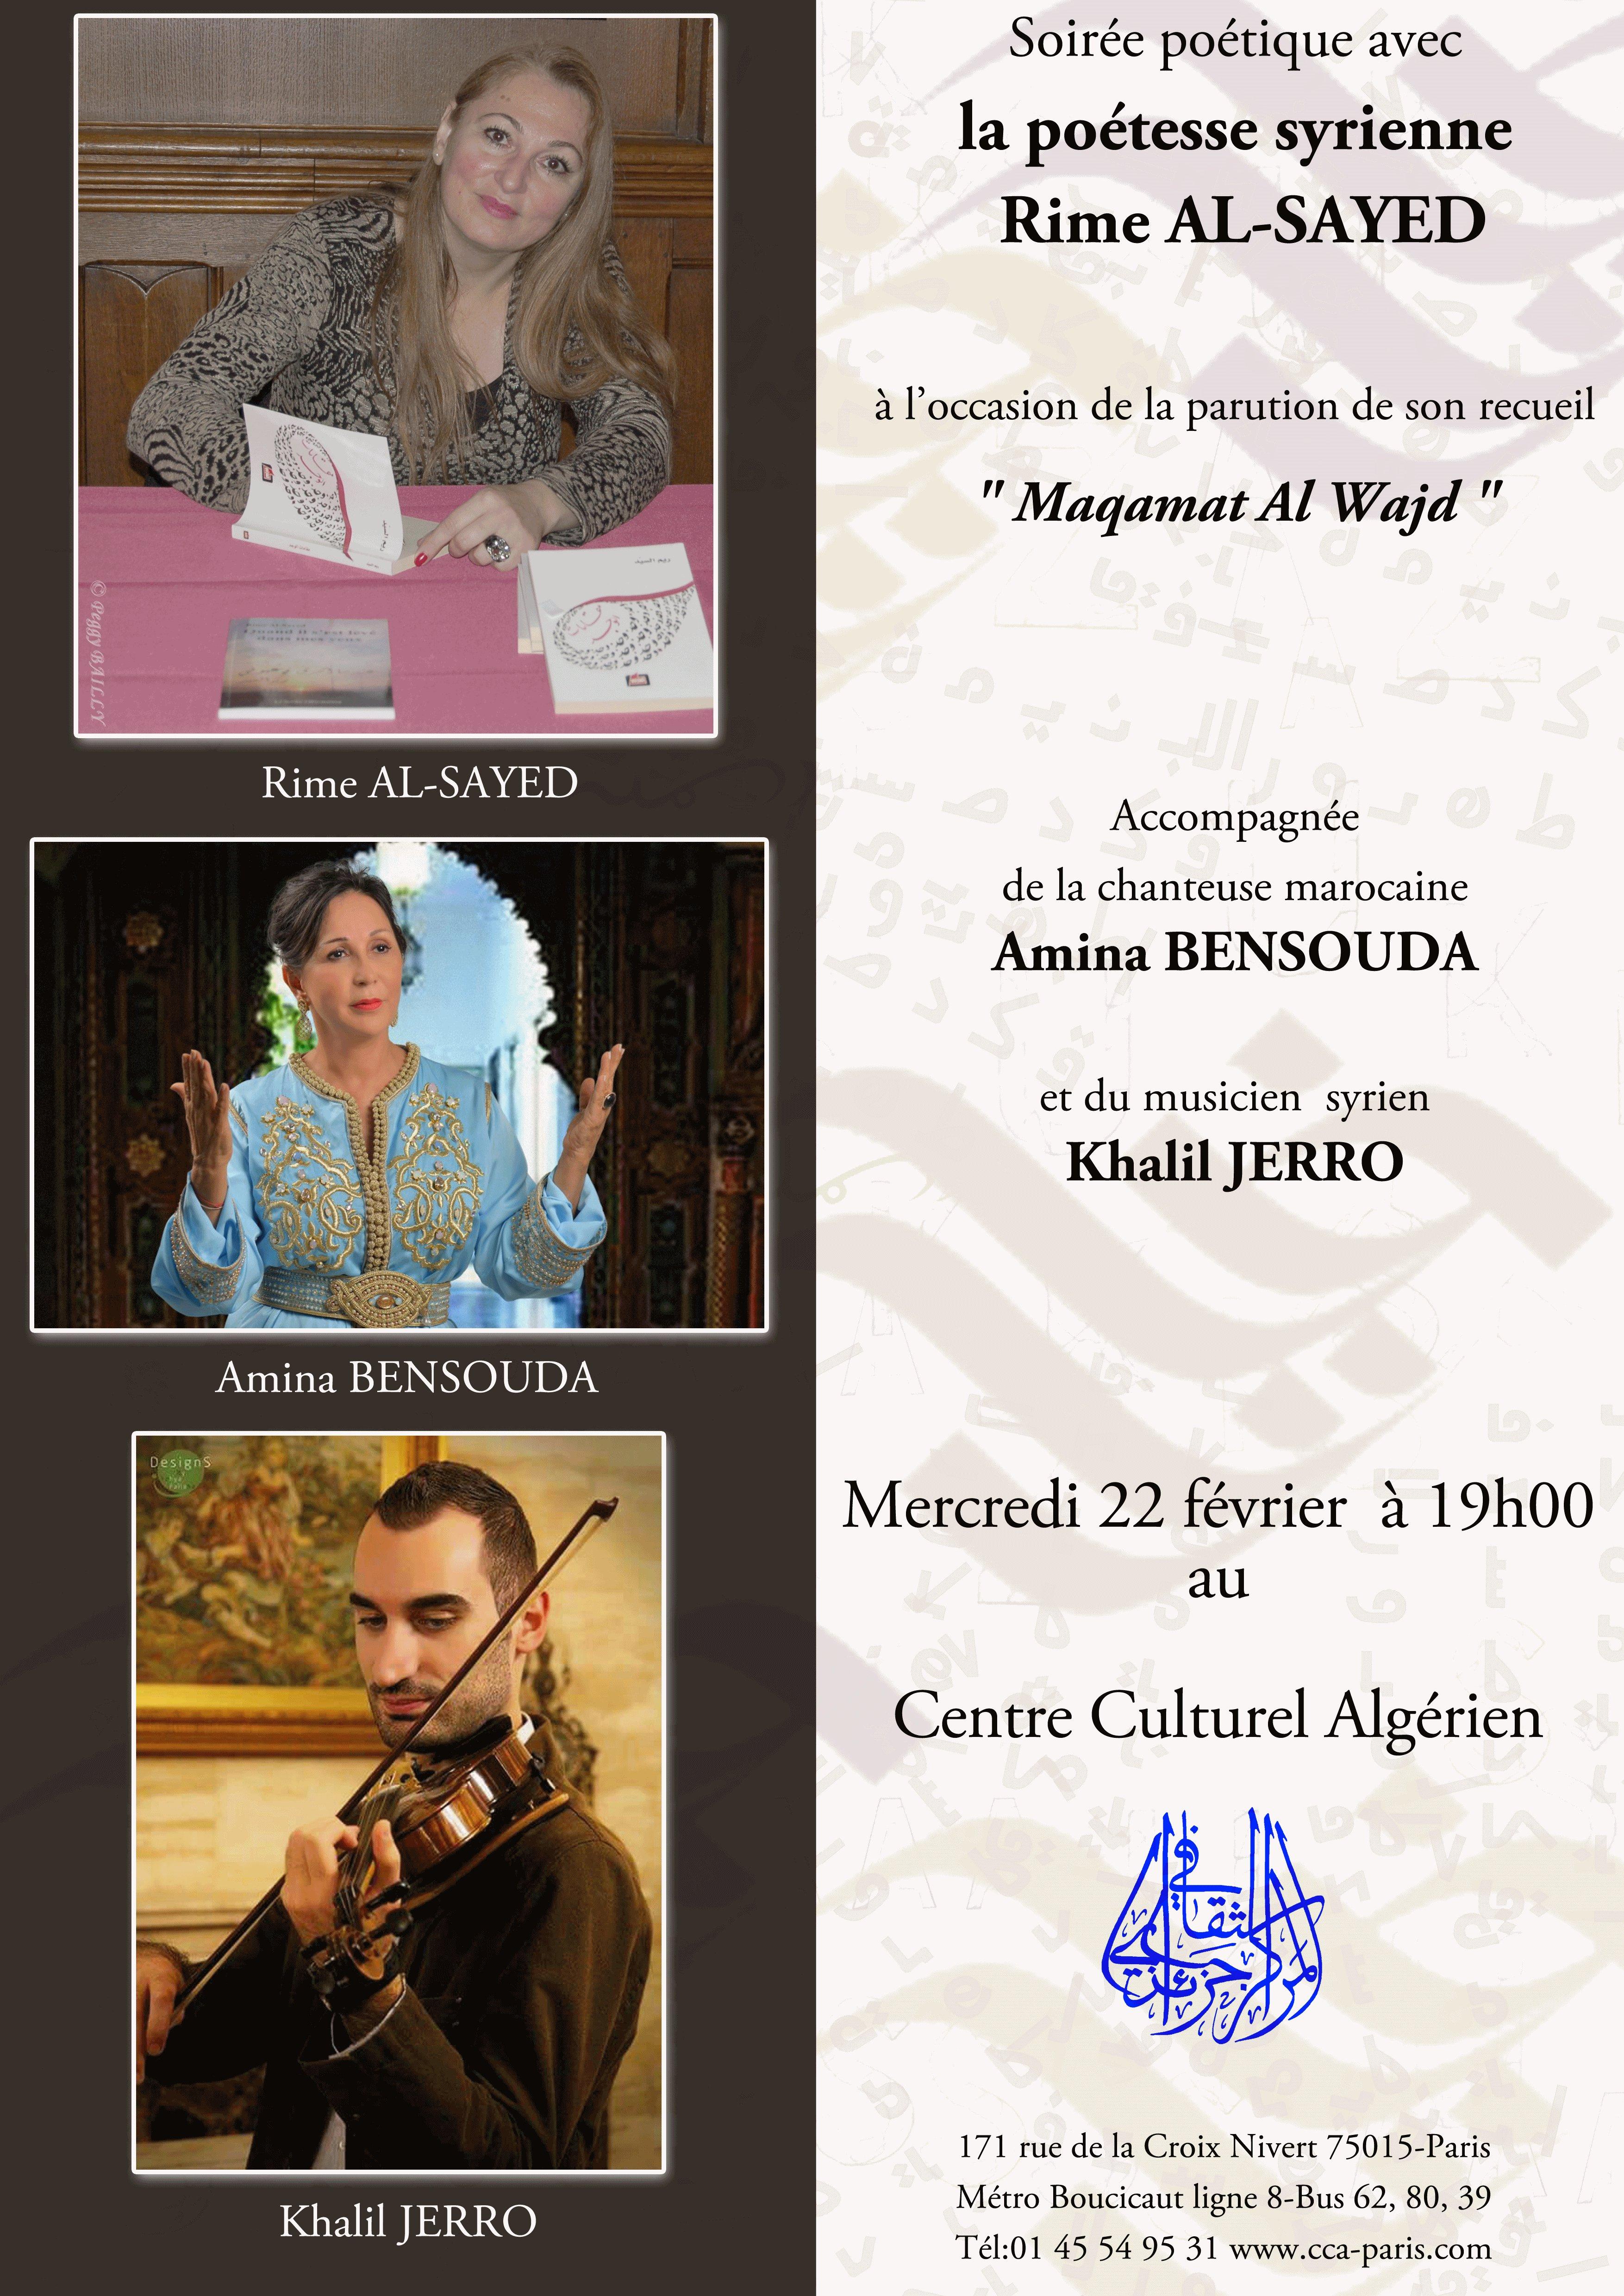 http://www.saphirnews.com/agenda/Soiree-poetique-et-musicale_ae474536.html